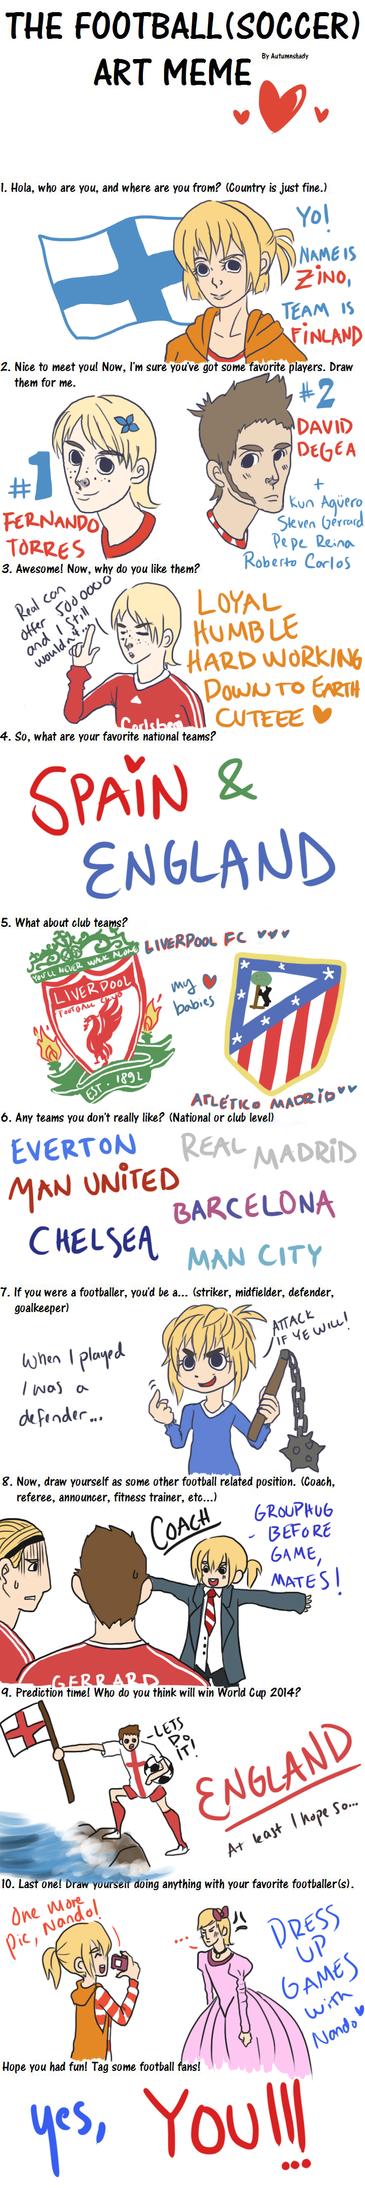 Football meme by Zinoman